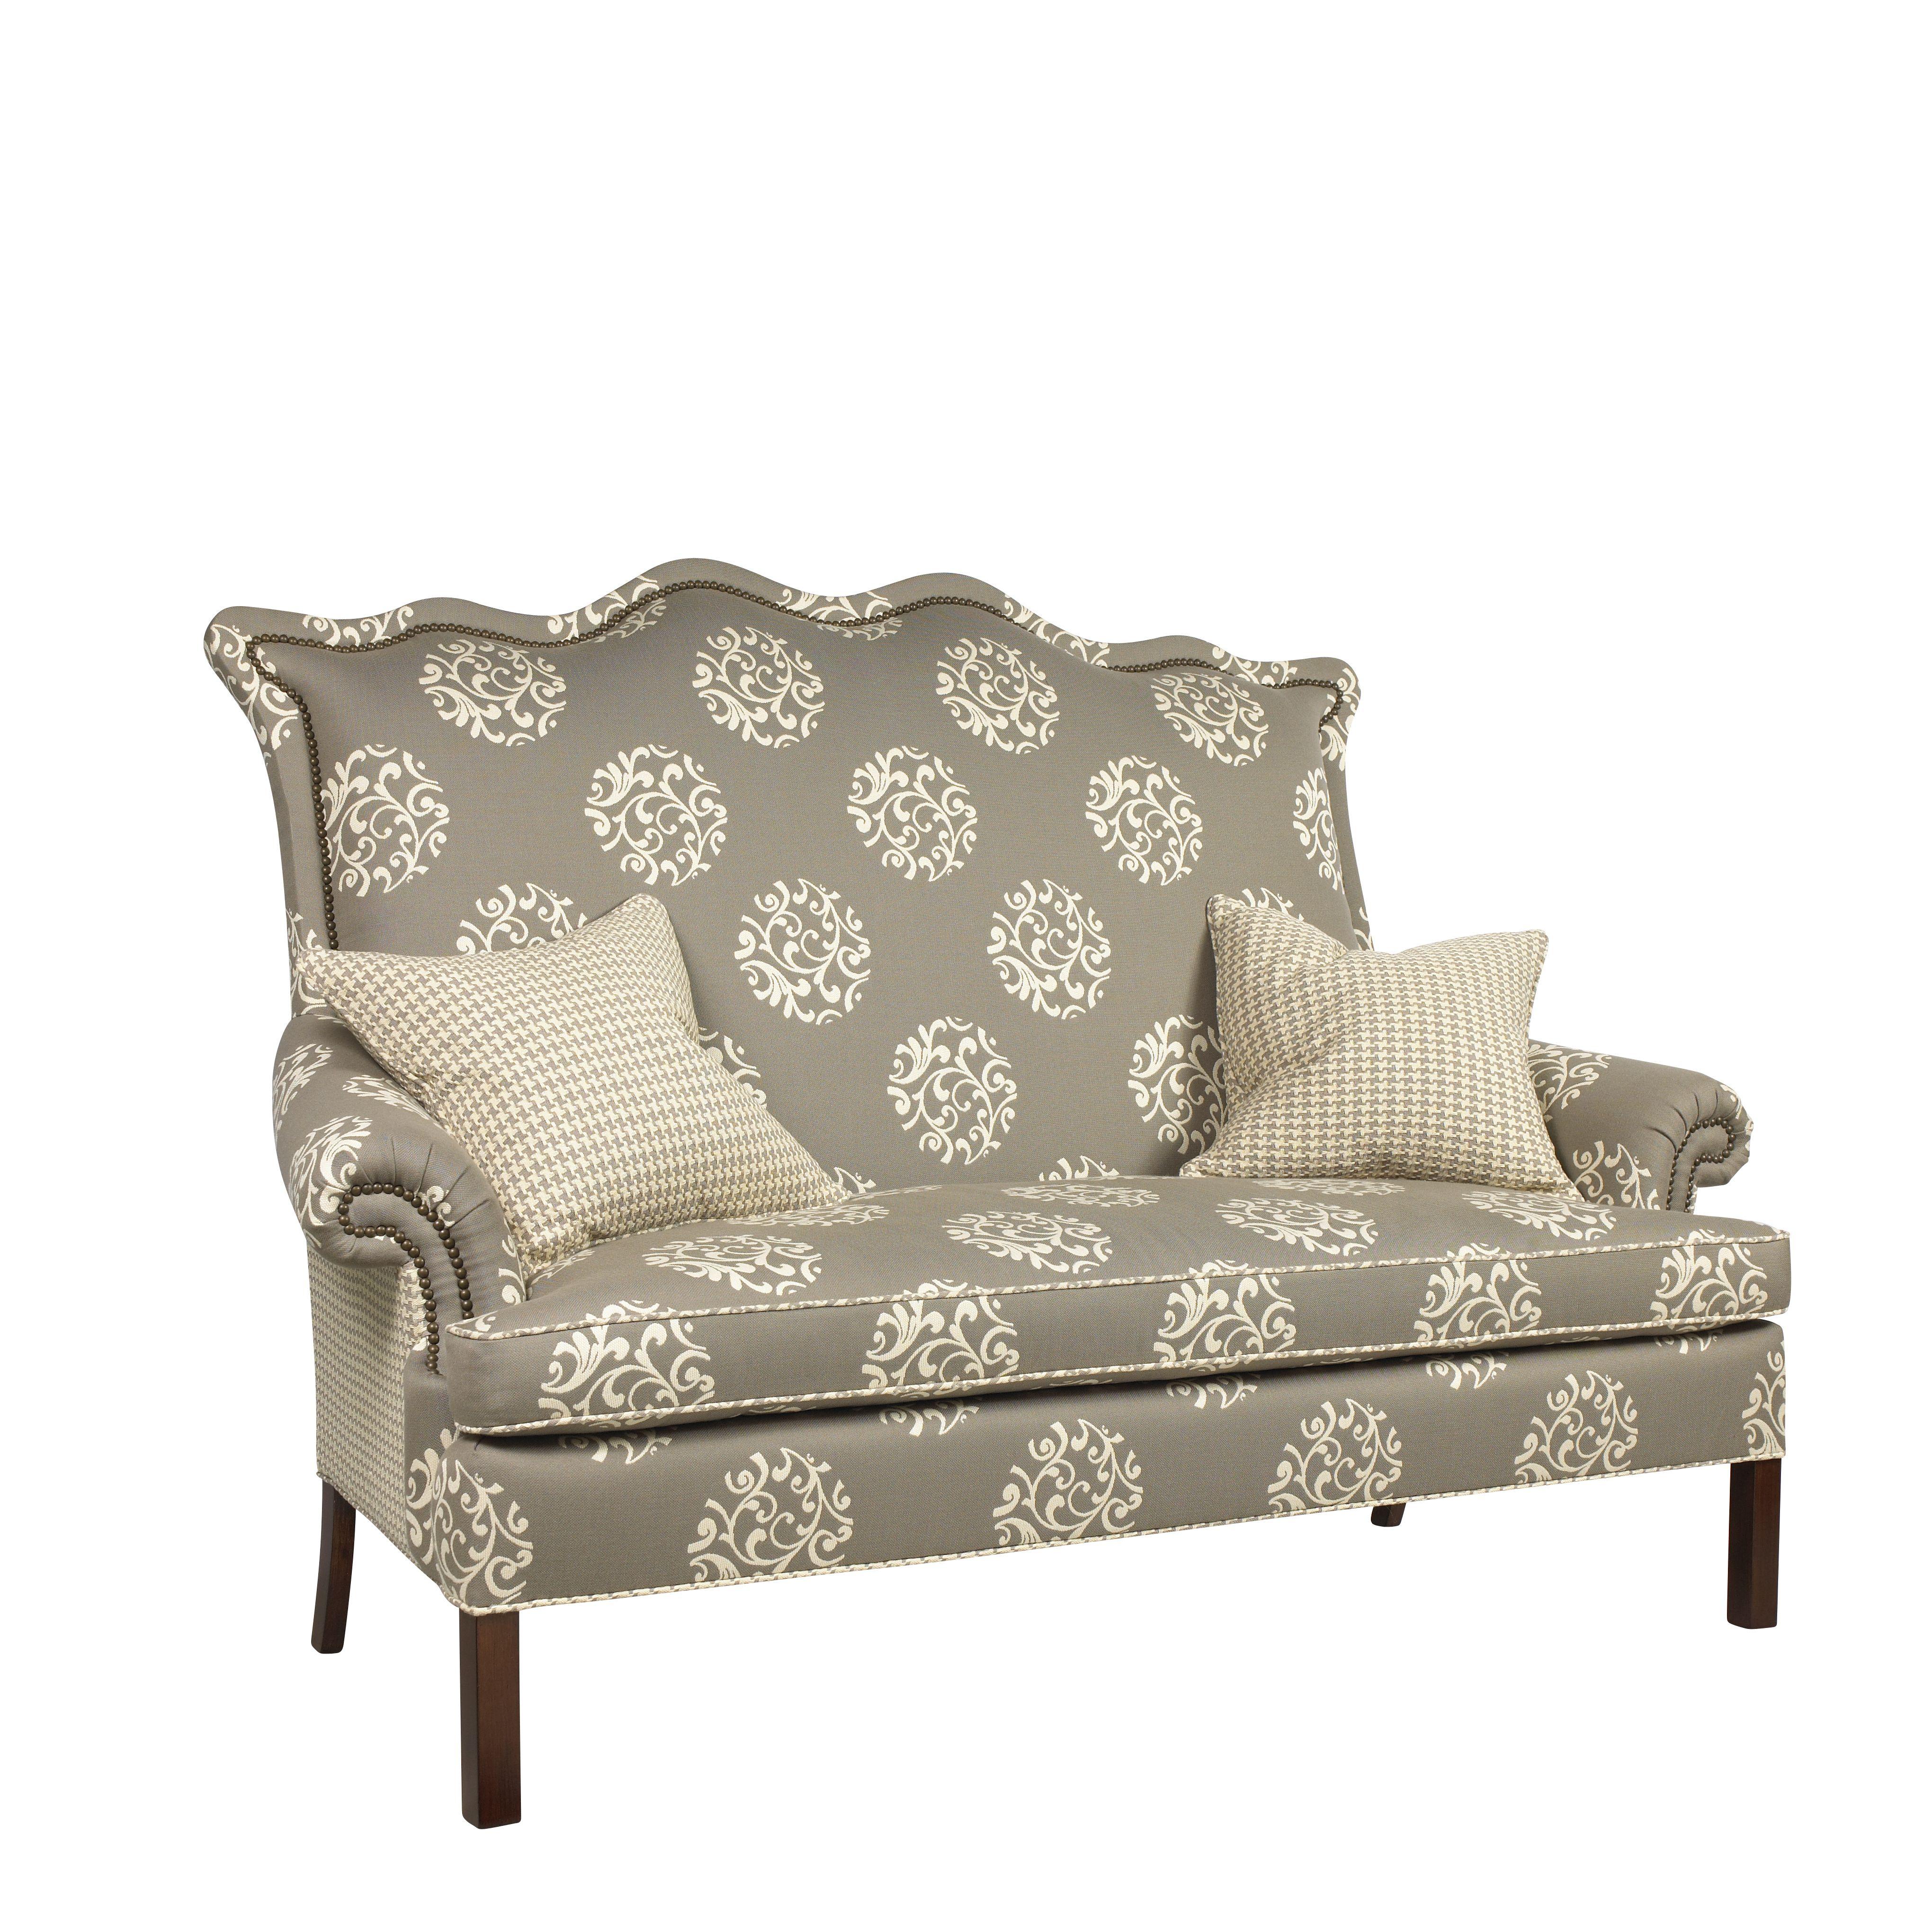 Super U 3060 0673 Dartagnan Sofa By French Heritage French Cjindustries Chair Design For Home Cjindustriesco